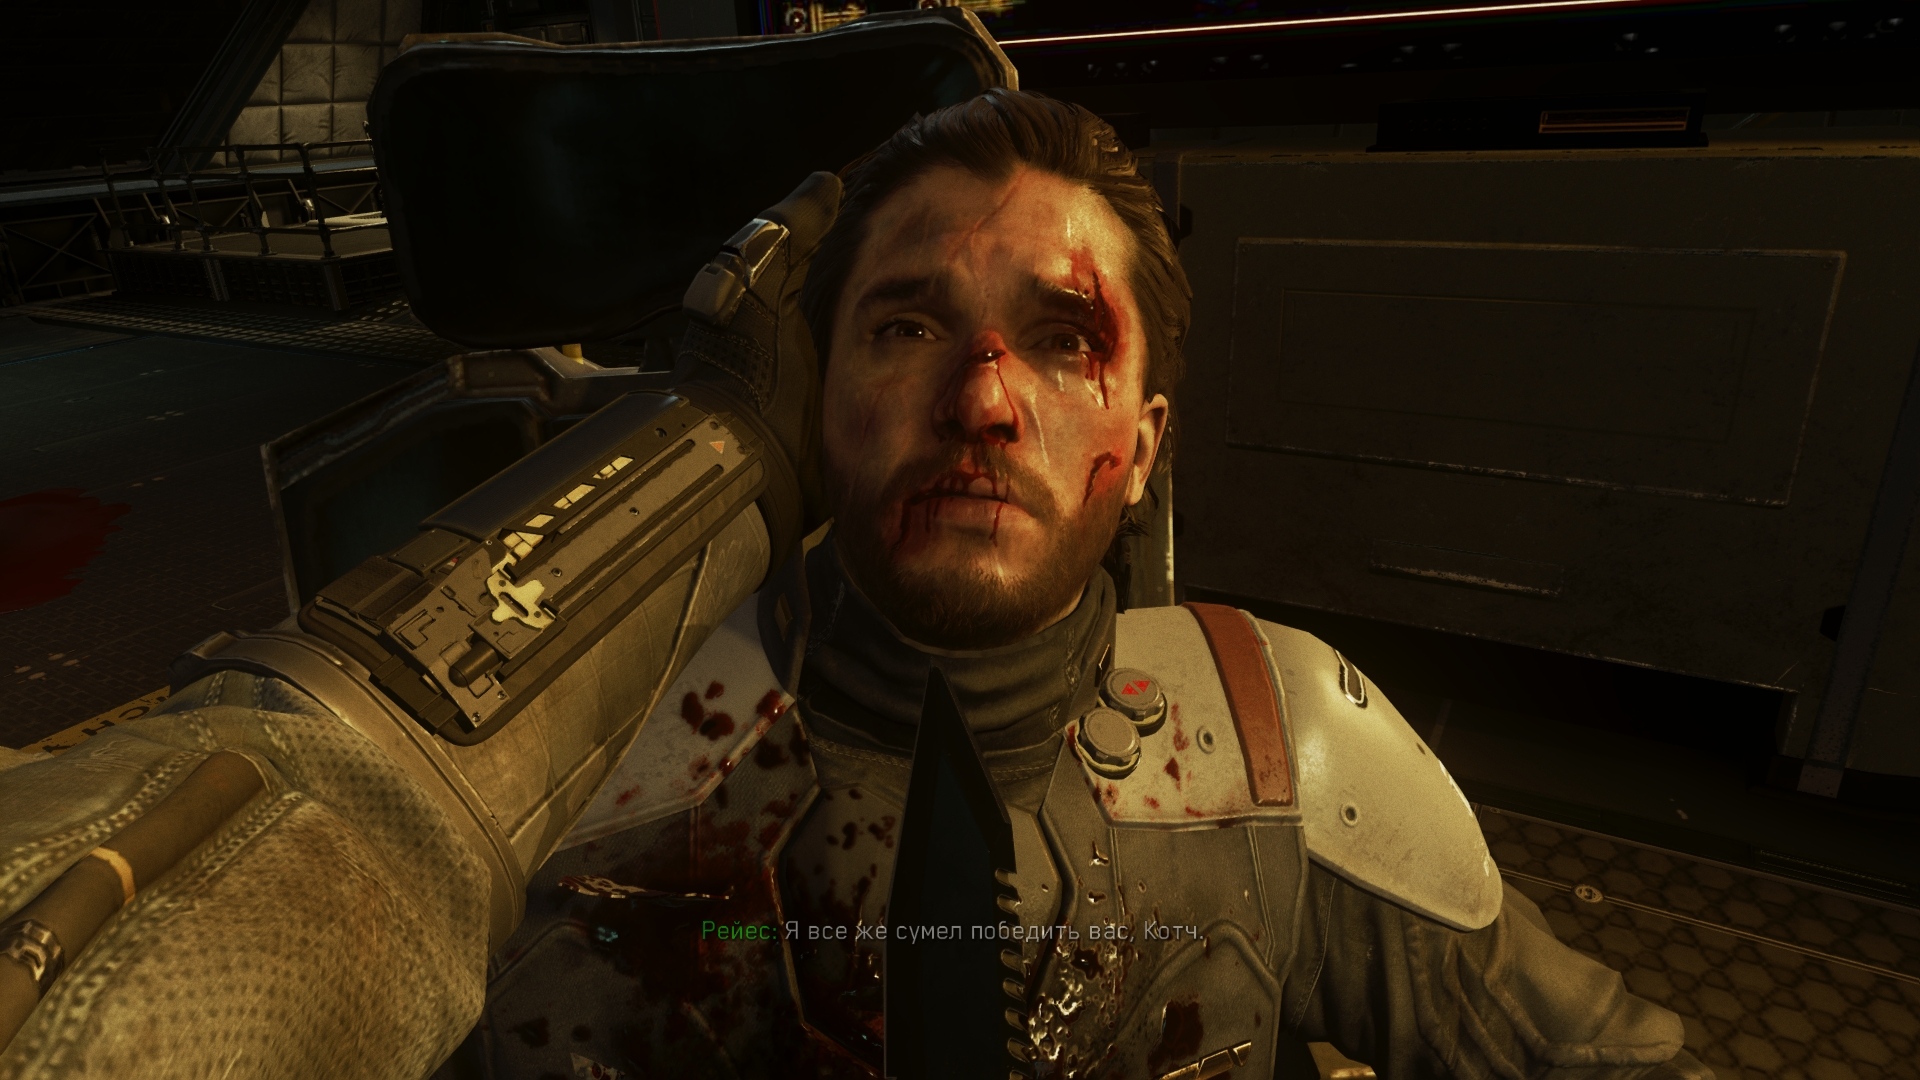 000106.Jpg - Call of Duty: Infinite Warfare